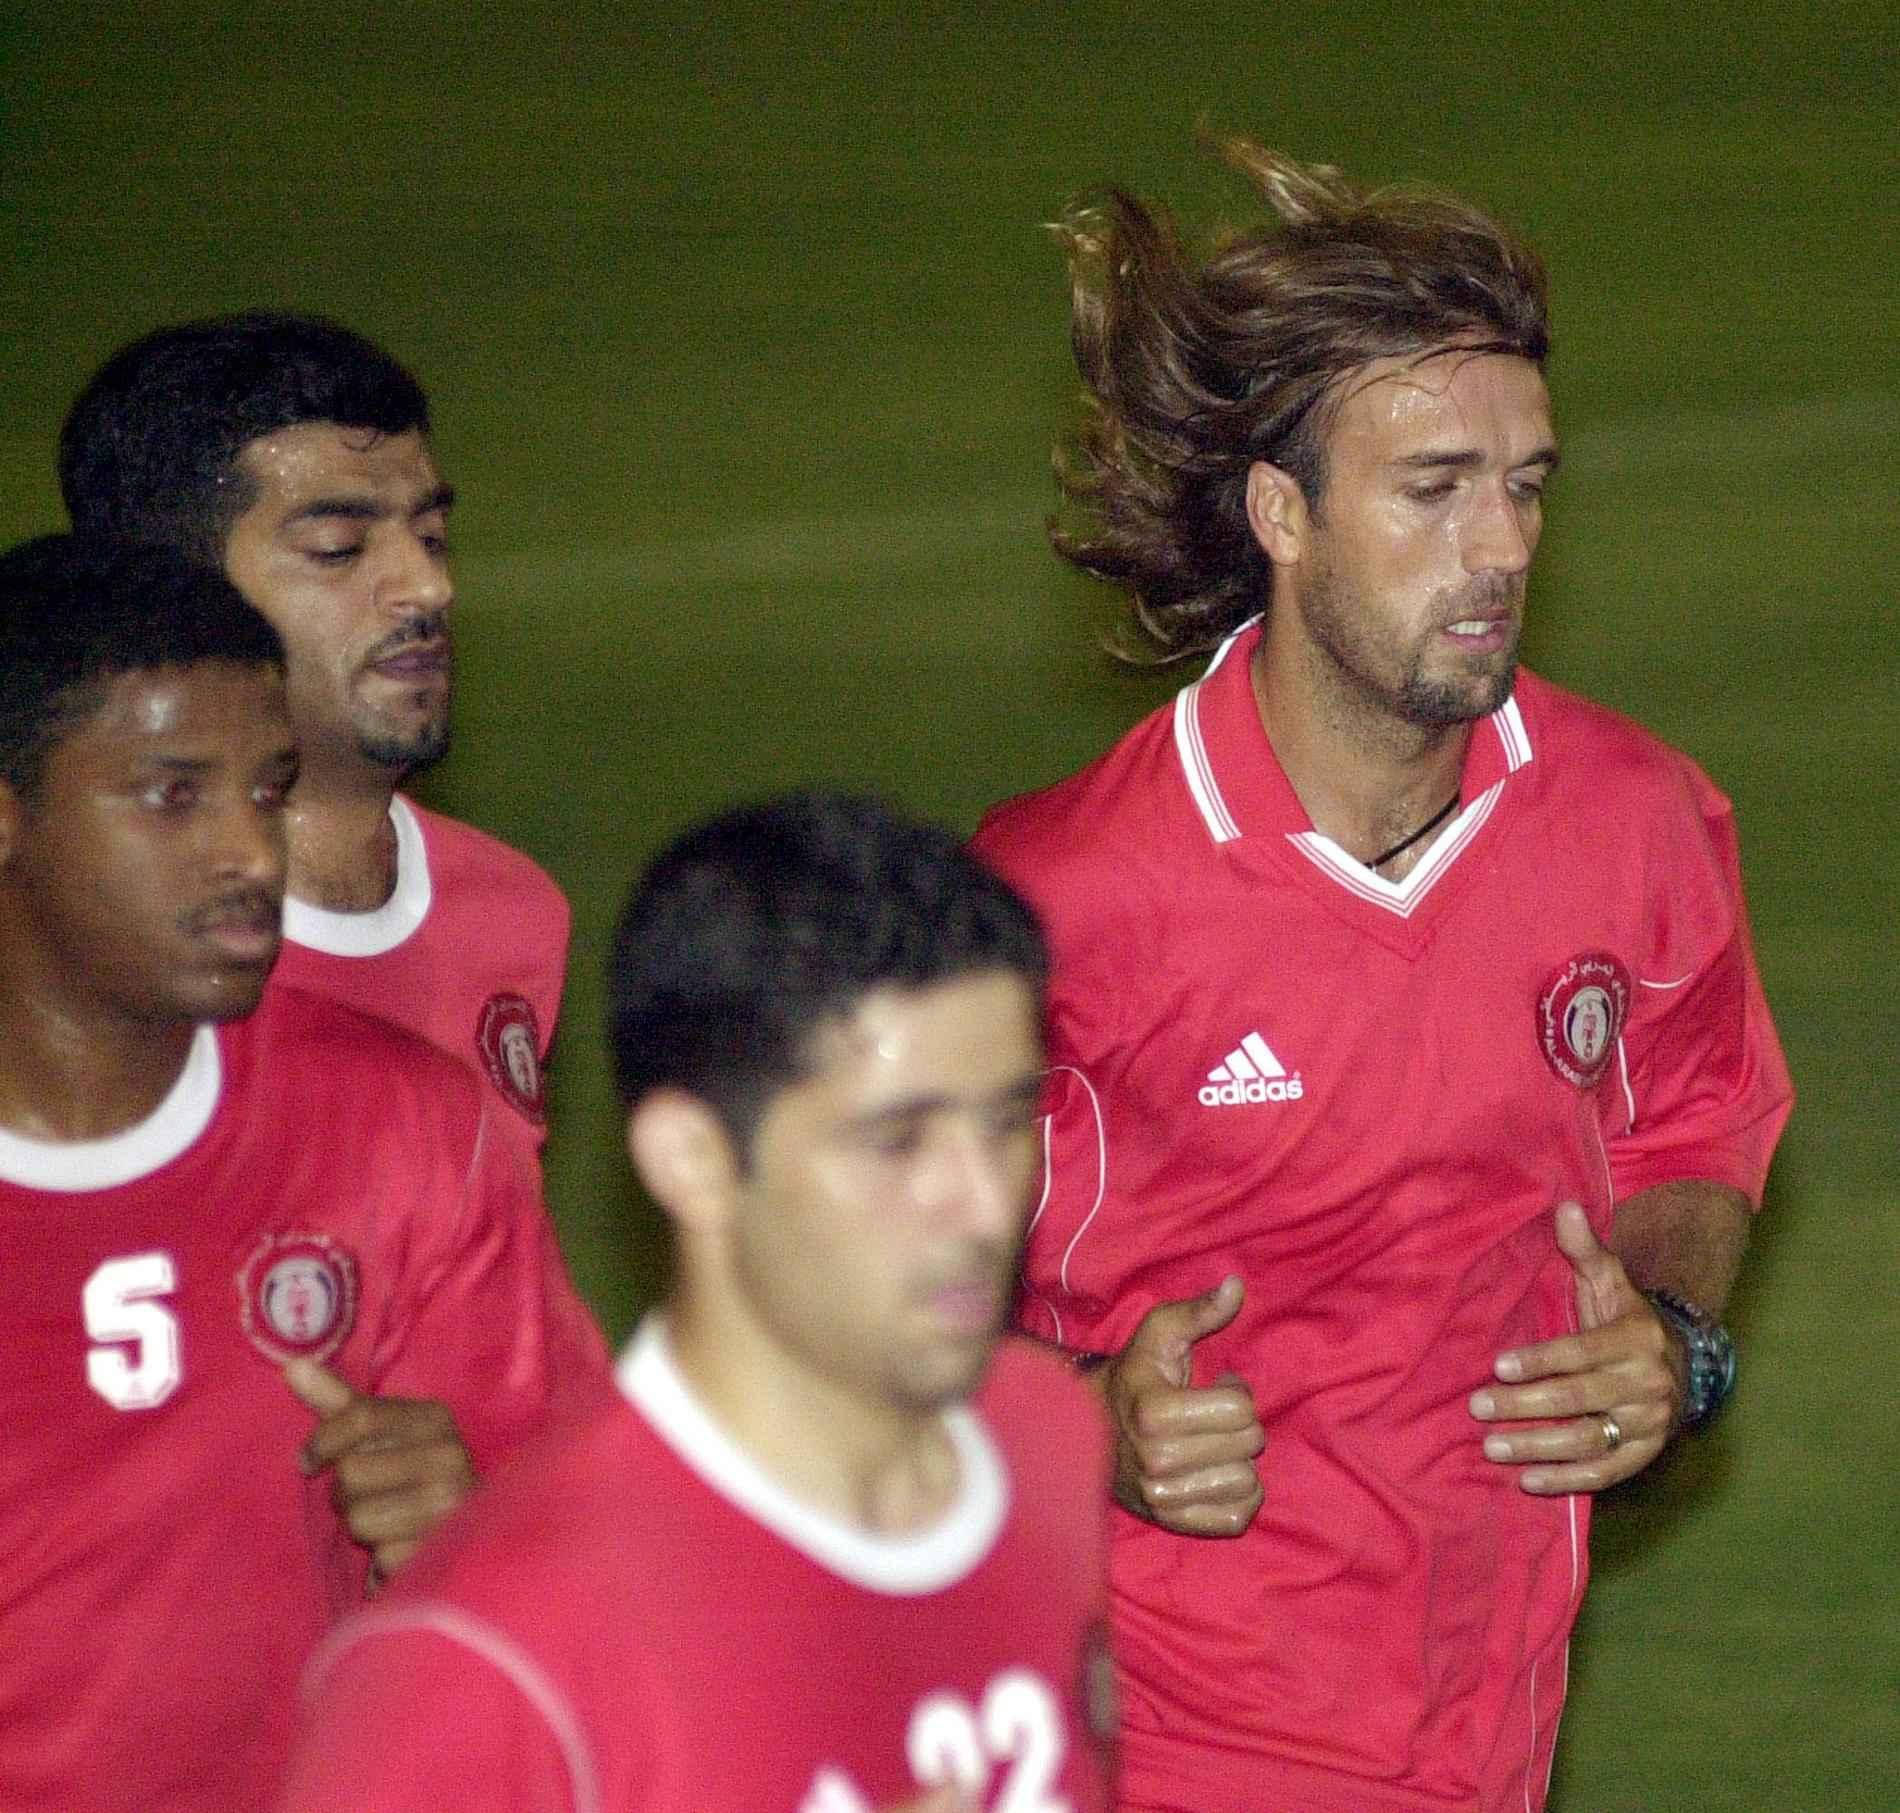 Прогноз на матч Лехвия - Аль Гарафа